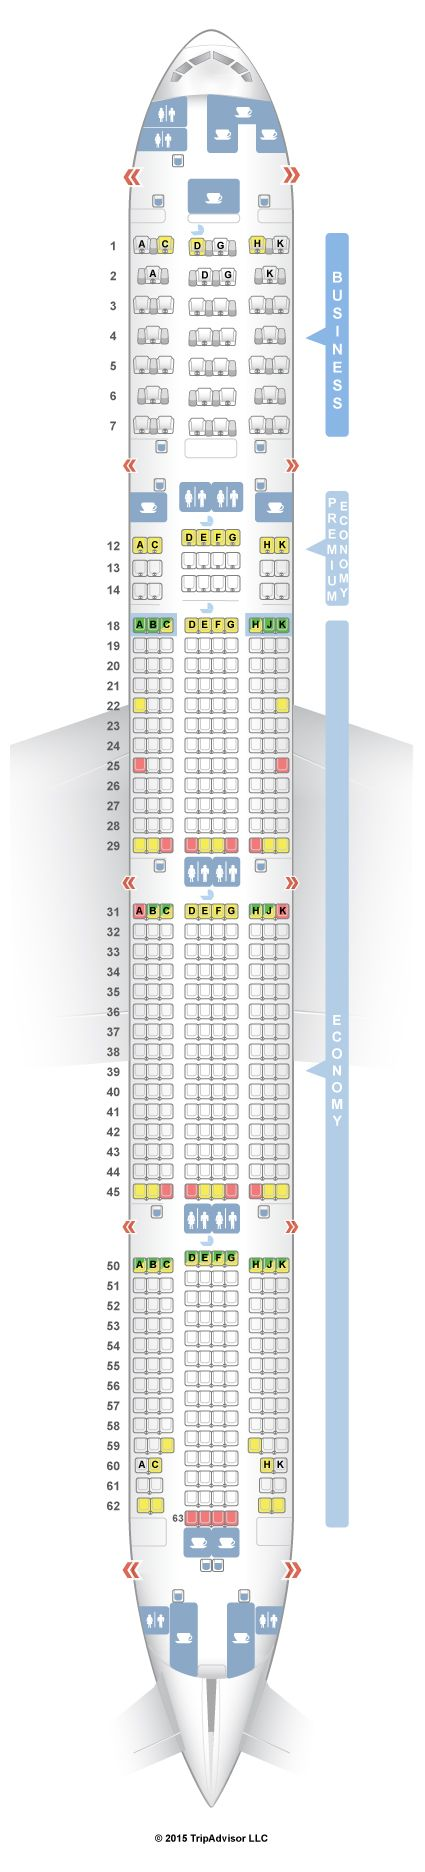 SeatGuru Seat Map Air Canada Boeing 777-300ER (77W) Three Class V1 - SeatGuru